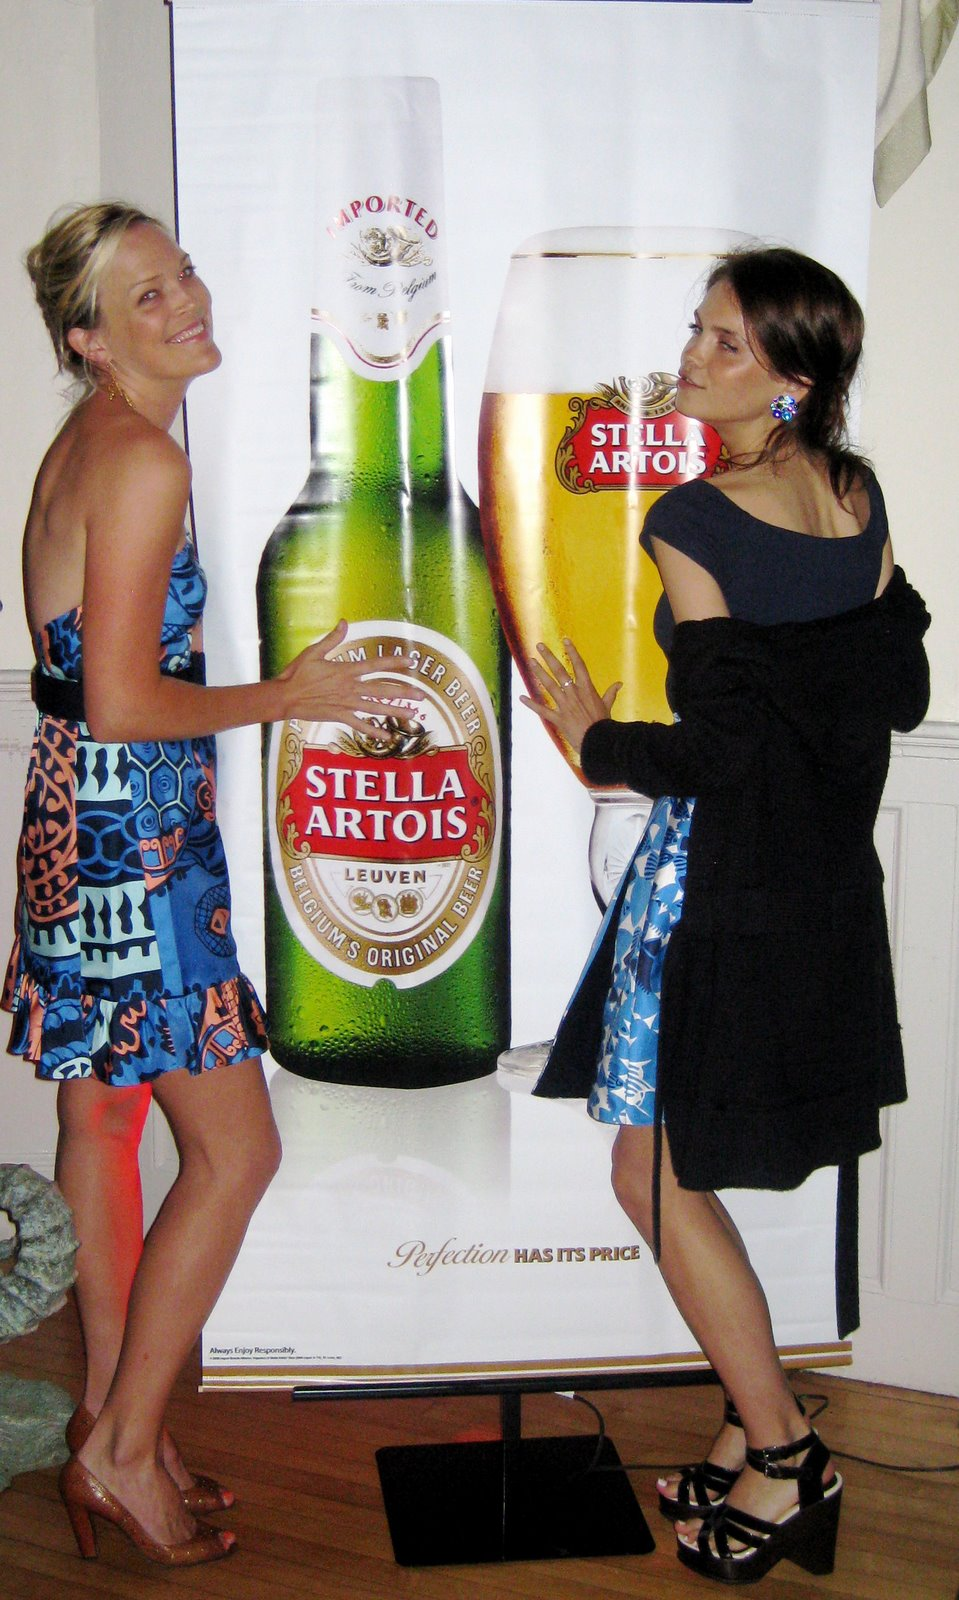 [Camilla+Bradley+Ali+Hill+CK+Bradley+Stella+Artois]